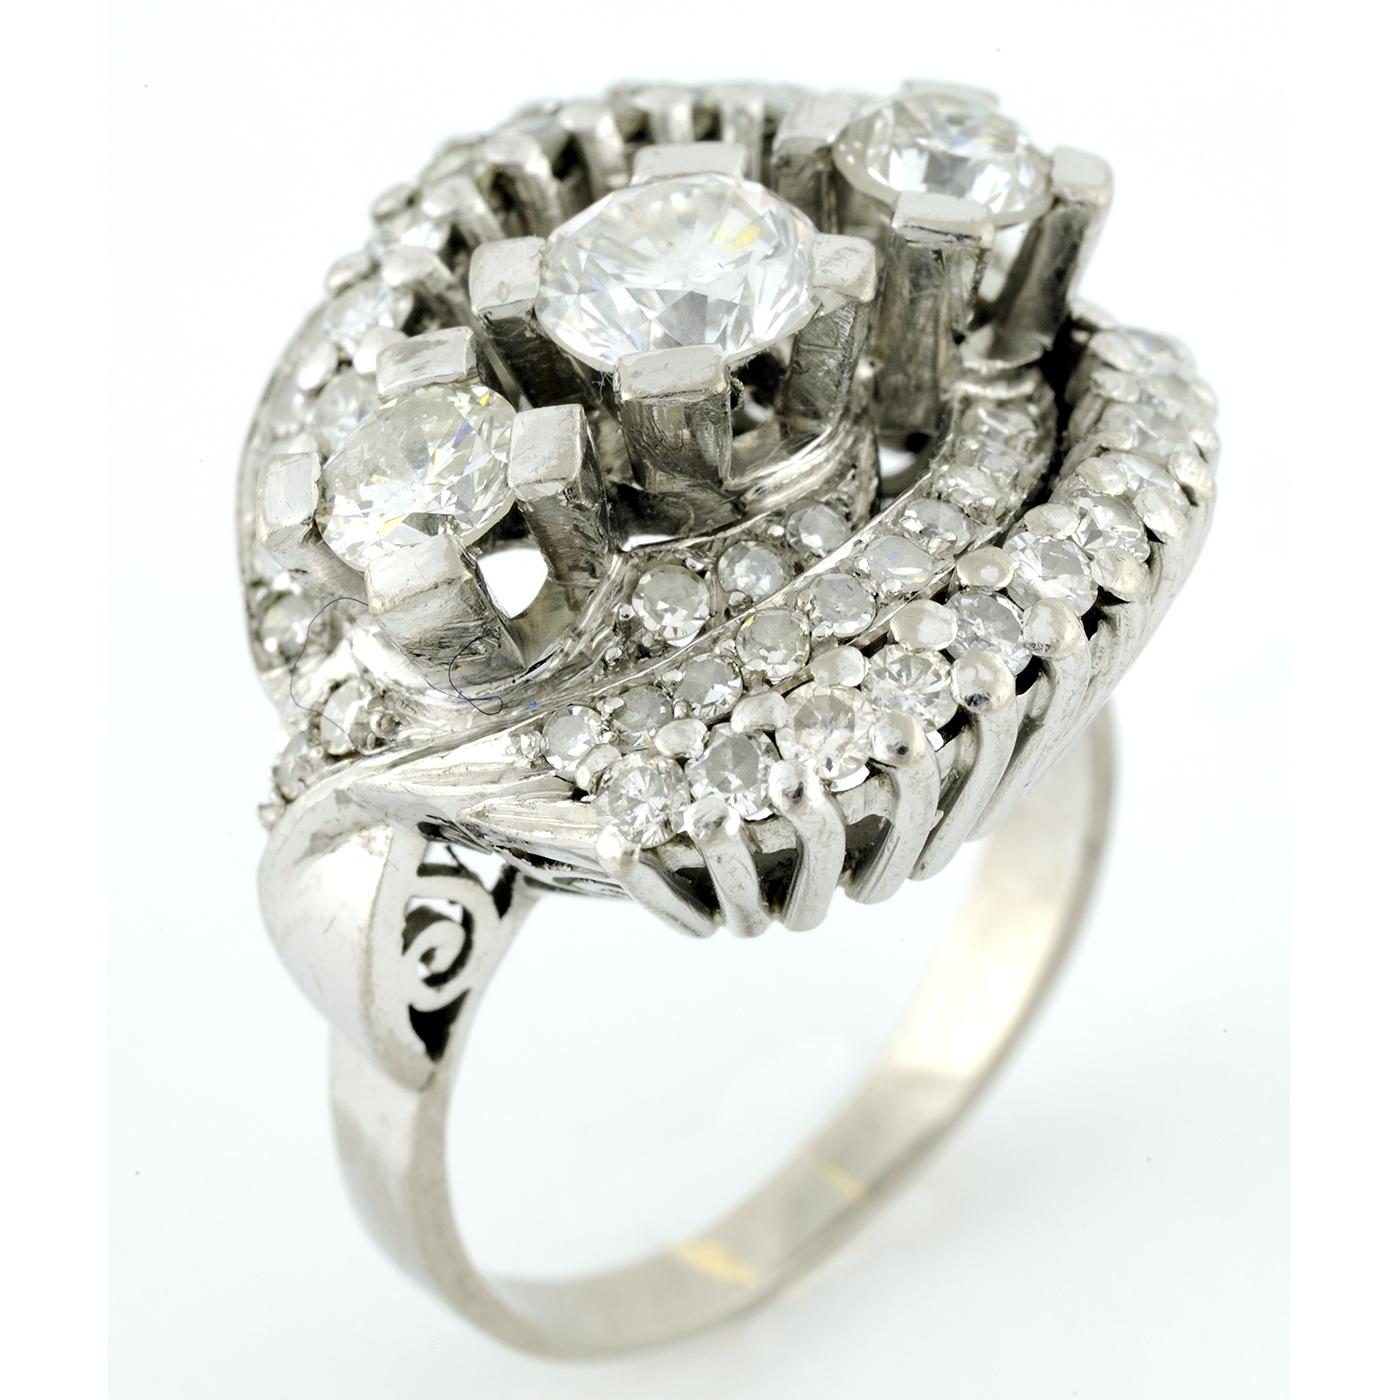 Sortija en Oro de 18k . 3 Diamantes talla Brillante, de 0,96 ct (G-SI1), 0,46 ct. (J-K/SI1), 0,40 (J-K/SI1) y 52 Diamantes con 1,10 ct. (J-K/SI1)